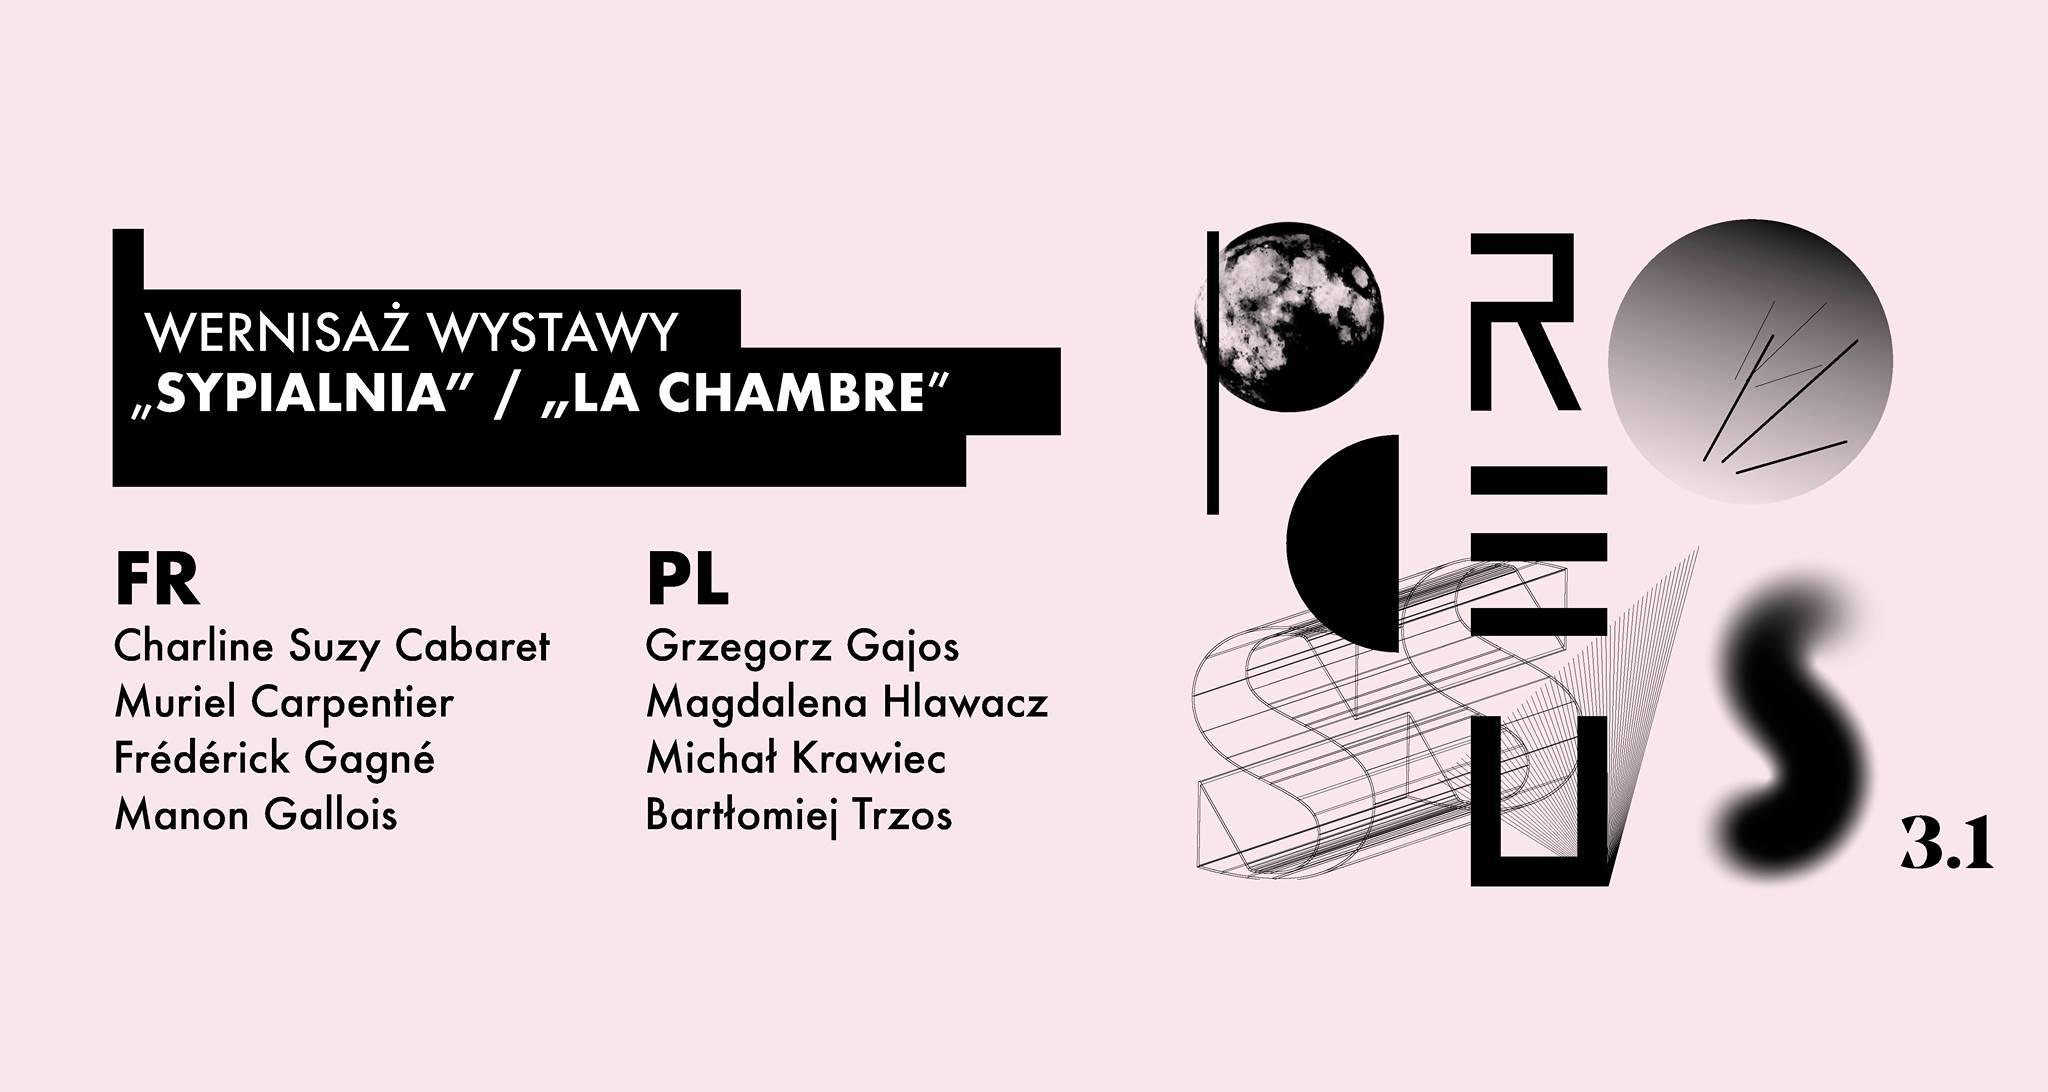 "Wernisaż wystawy ""sypialnia"" / ""La chambre"""